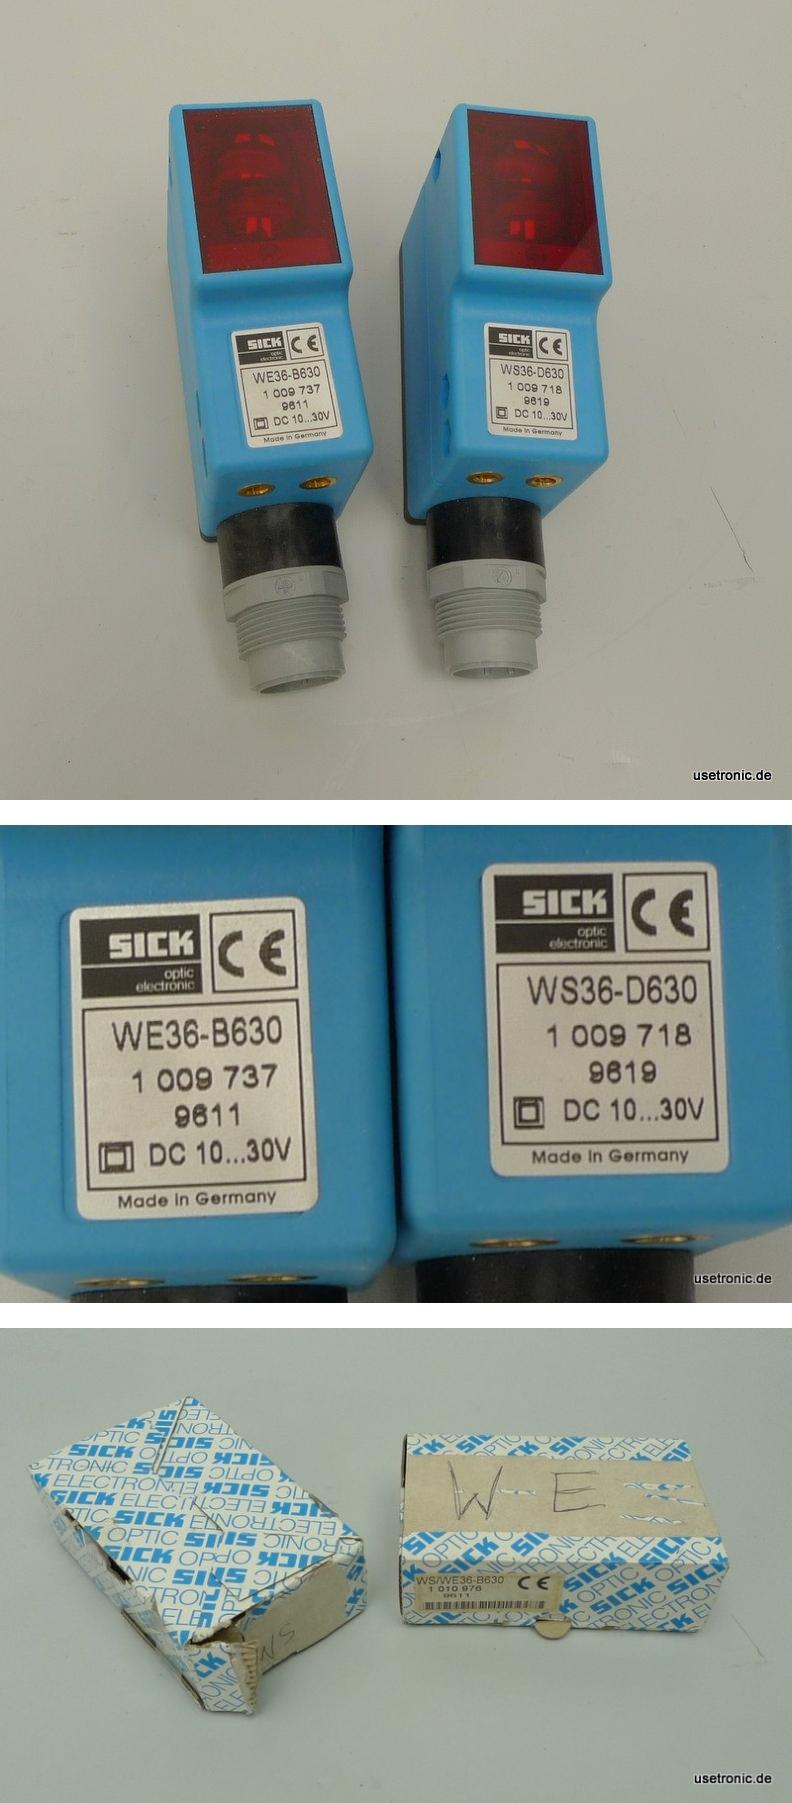 Sick WE36-B630